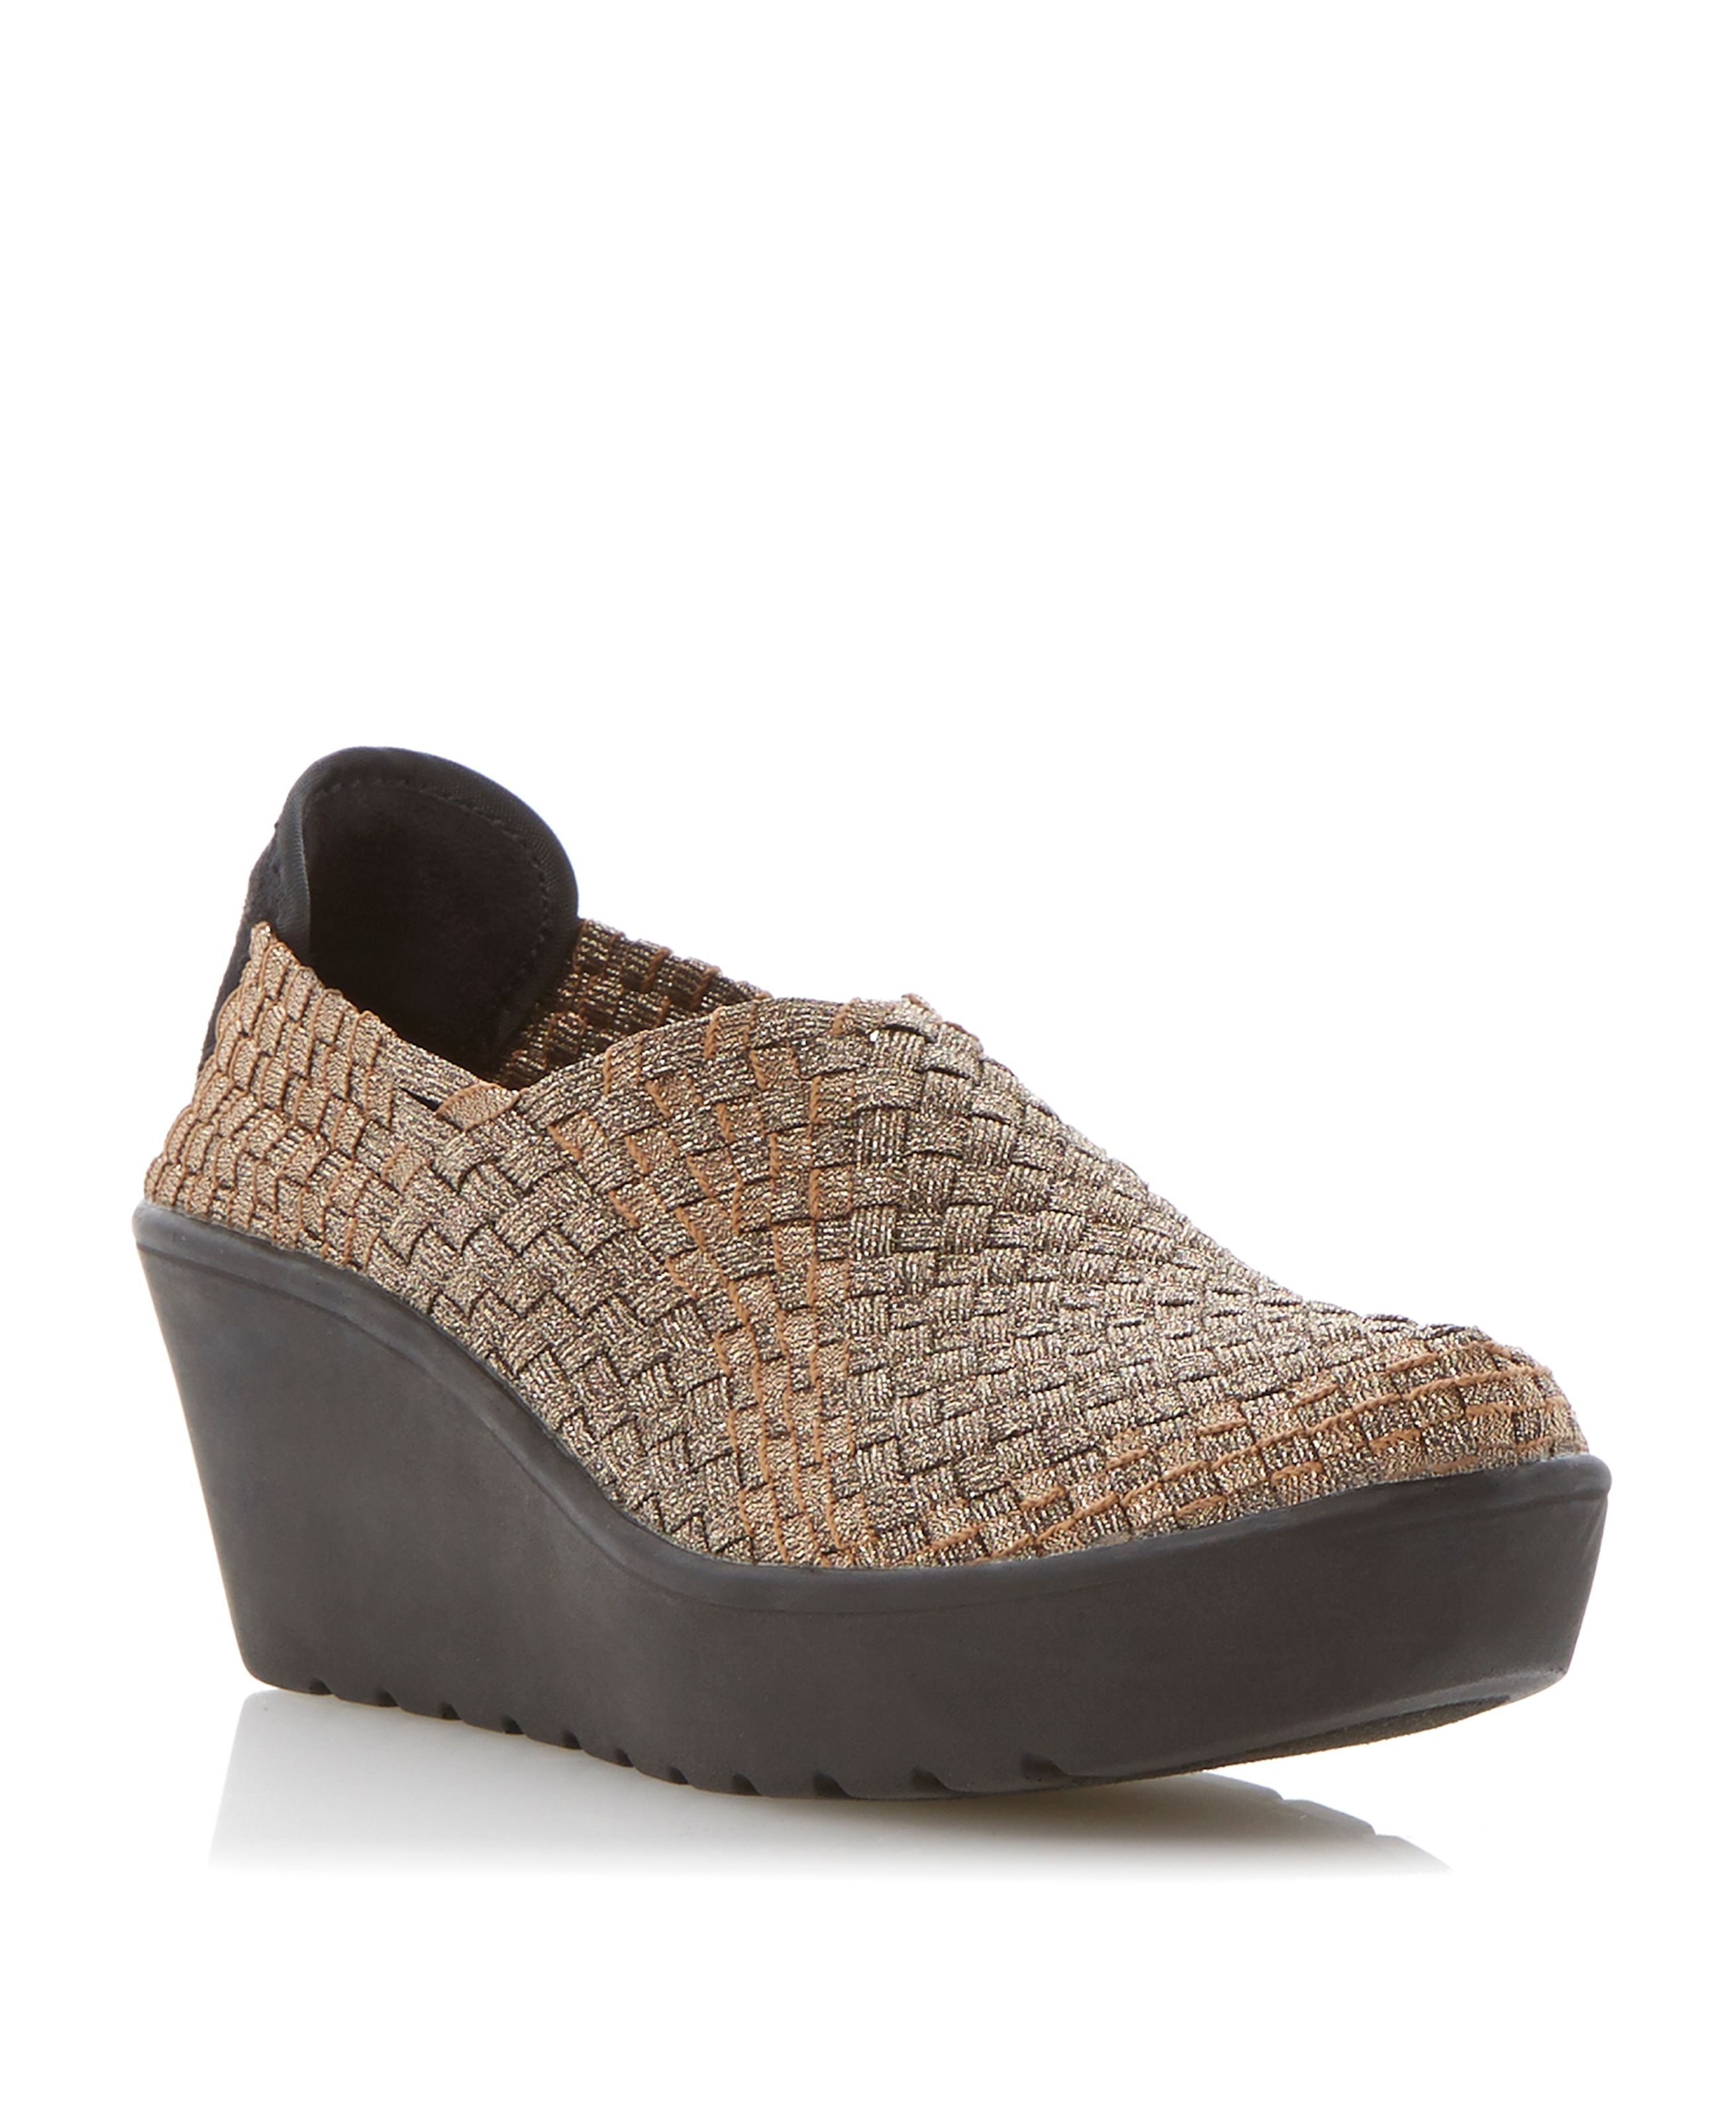 dbe2927d1d8 Steve madden betsi sm woven elastic shoes.pumps. Upper - synthetic .